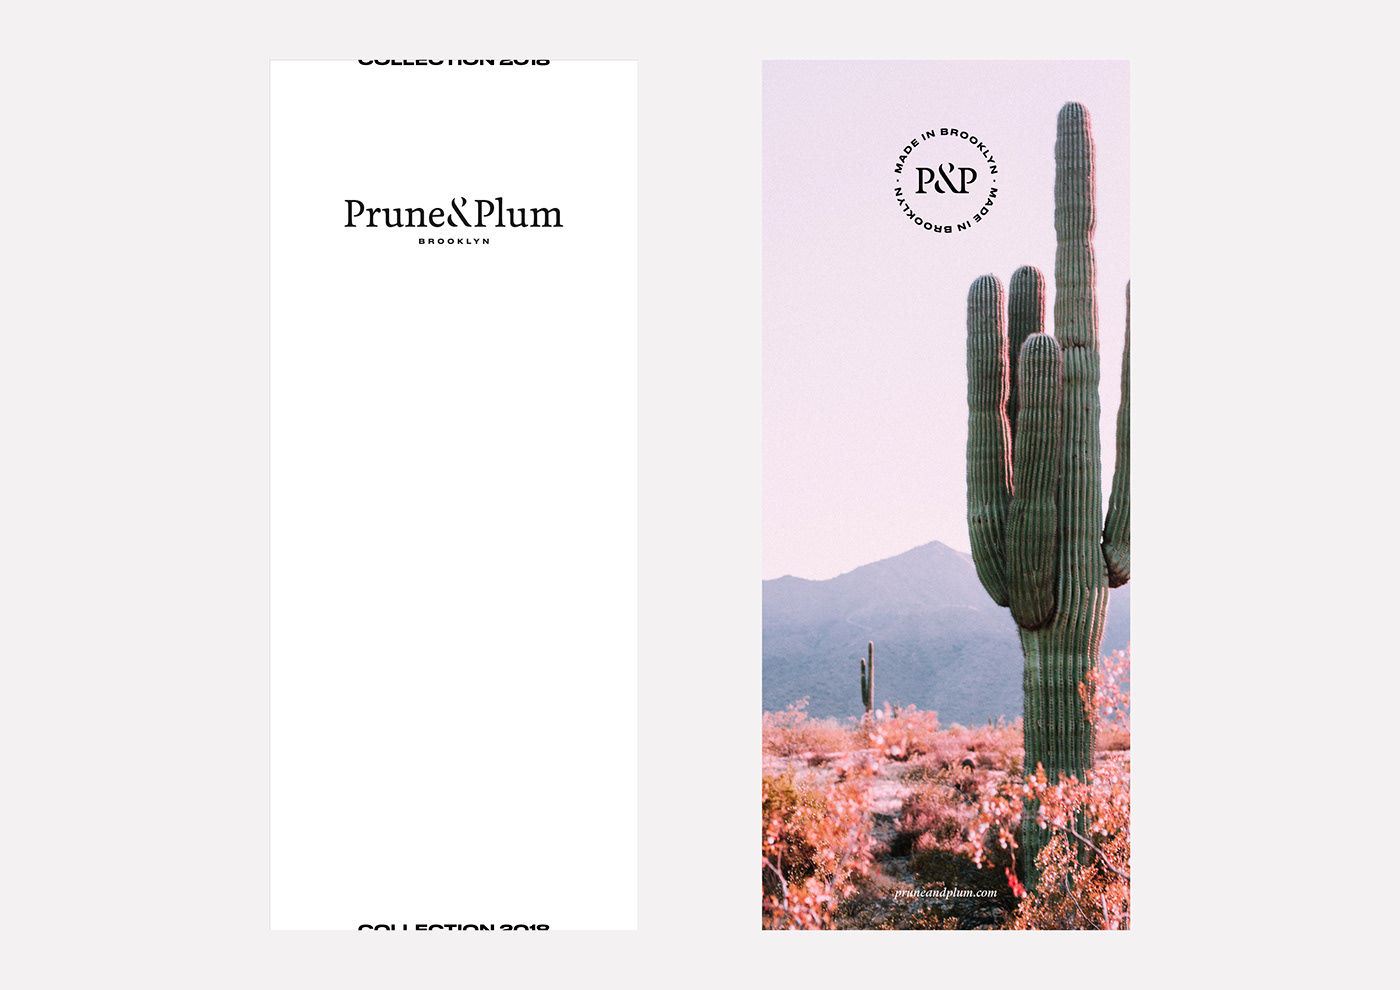 pruneandplum cactus Succulent Brooklyn Made in Brooklyn urban jungle indoor plant ono studio belgium